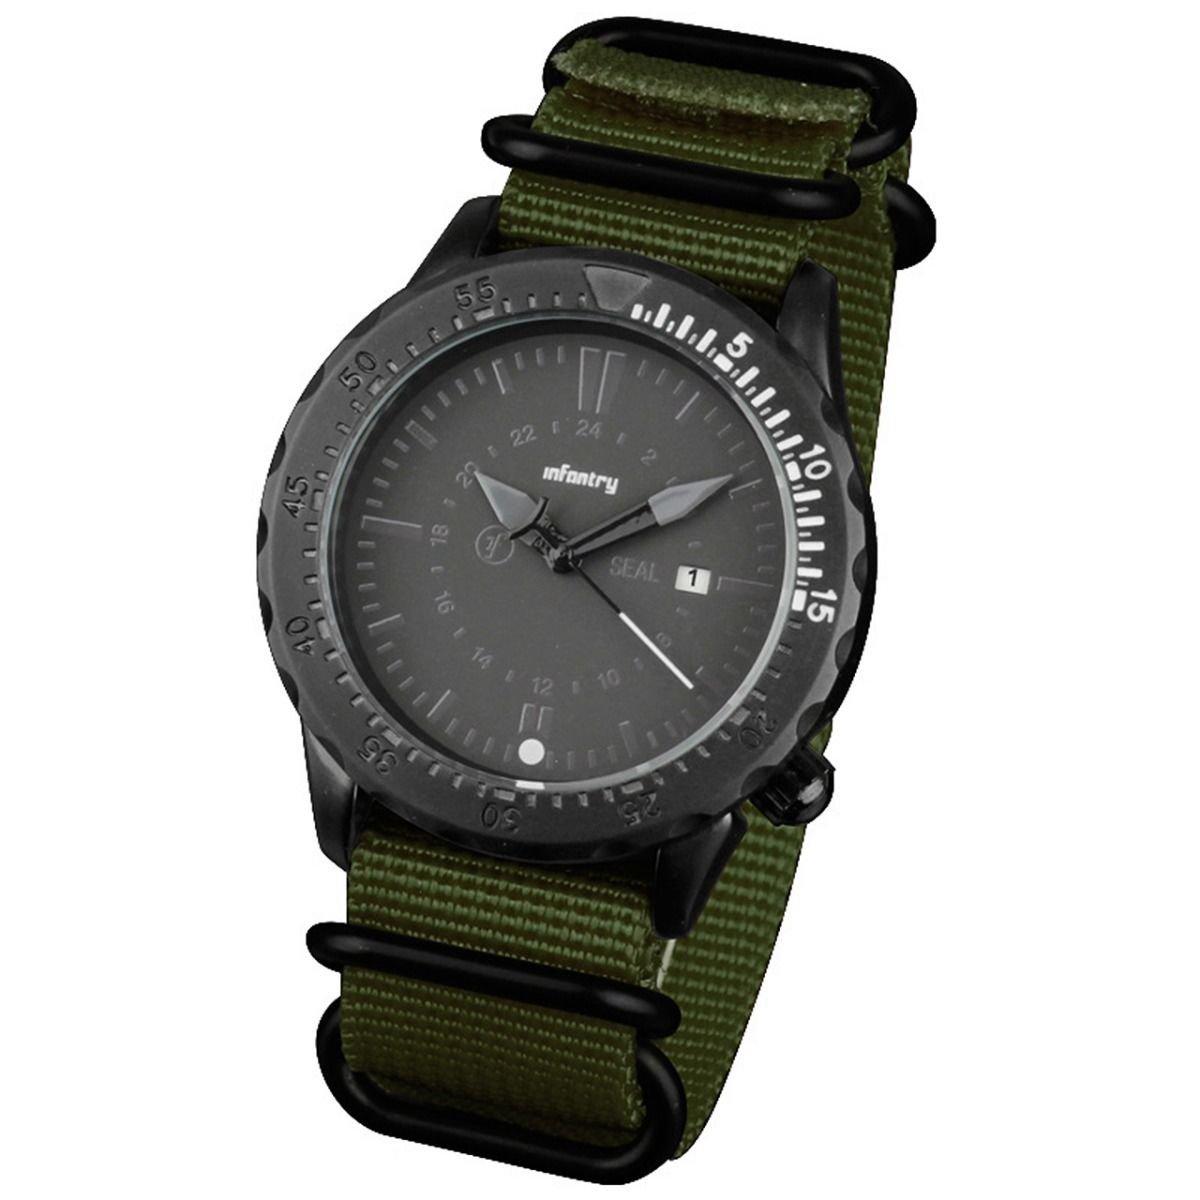 Green Band and White Infantry Mens Sport Quartz Watch Tachymeter Bezel Nylon